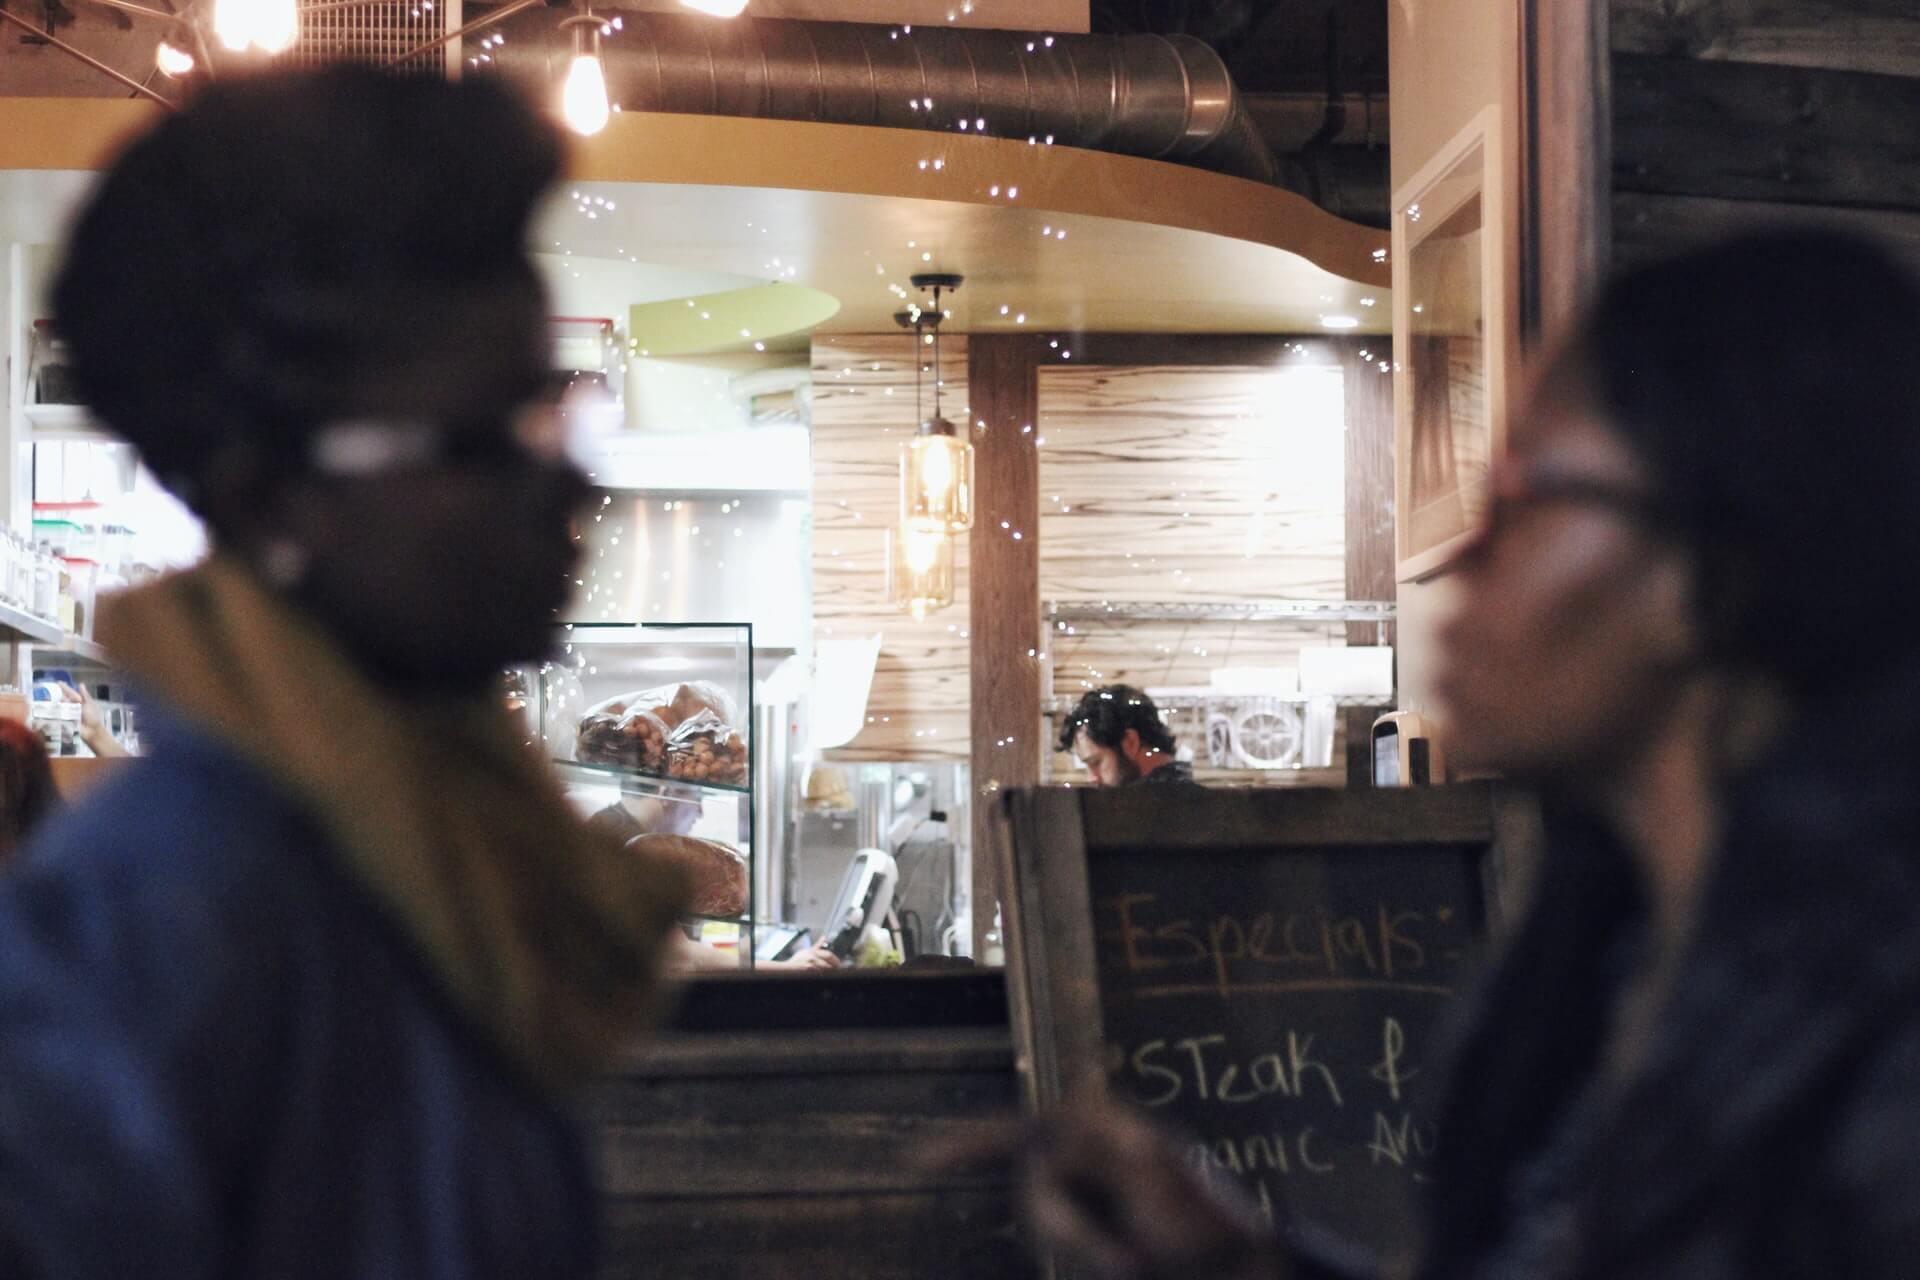 Women speaking outside a restaurant